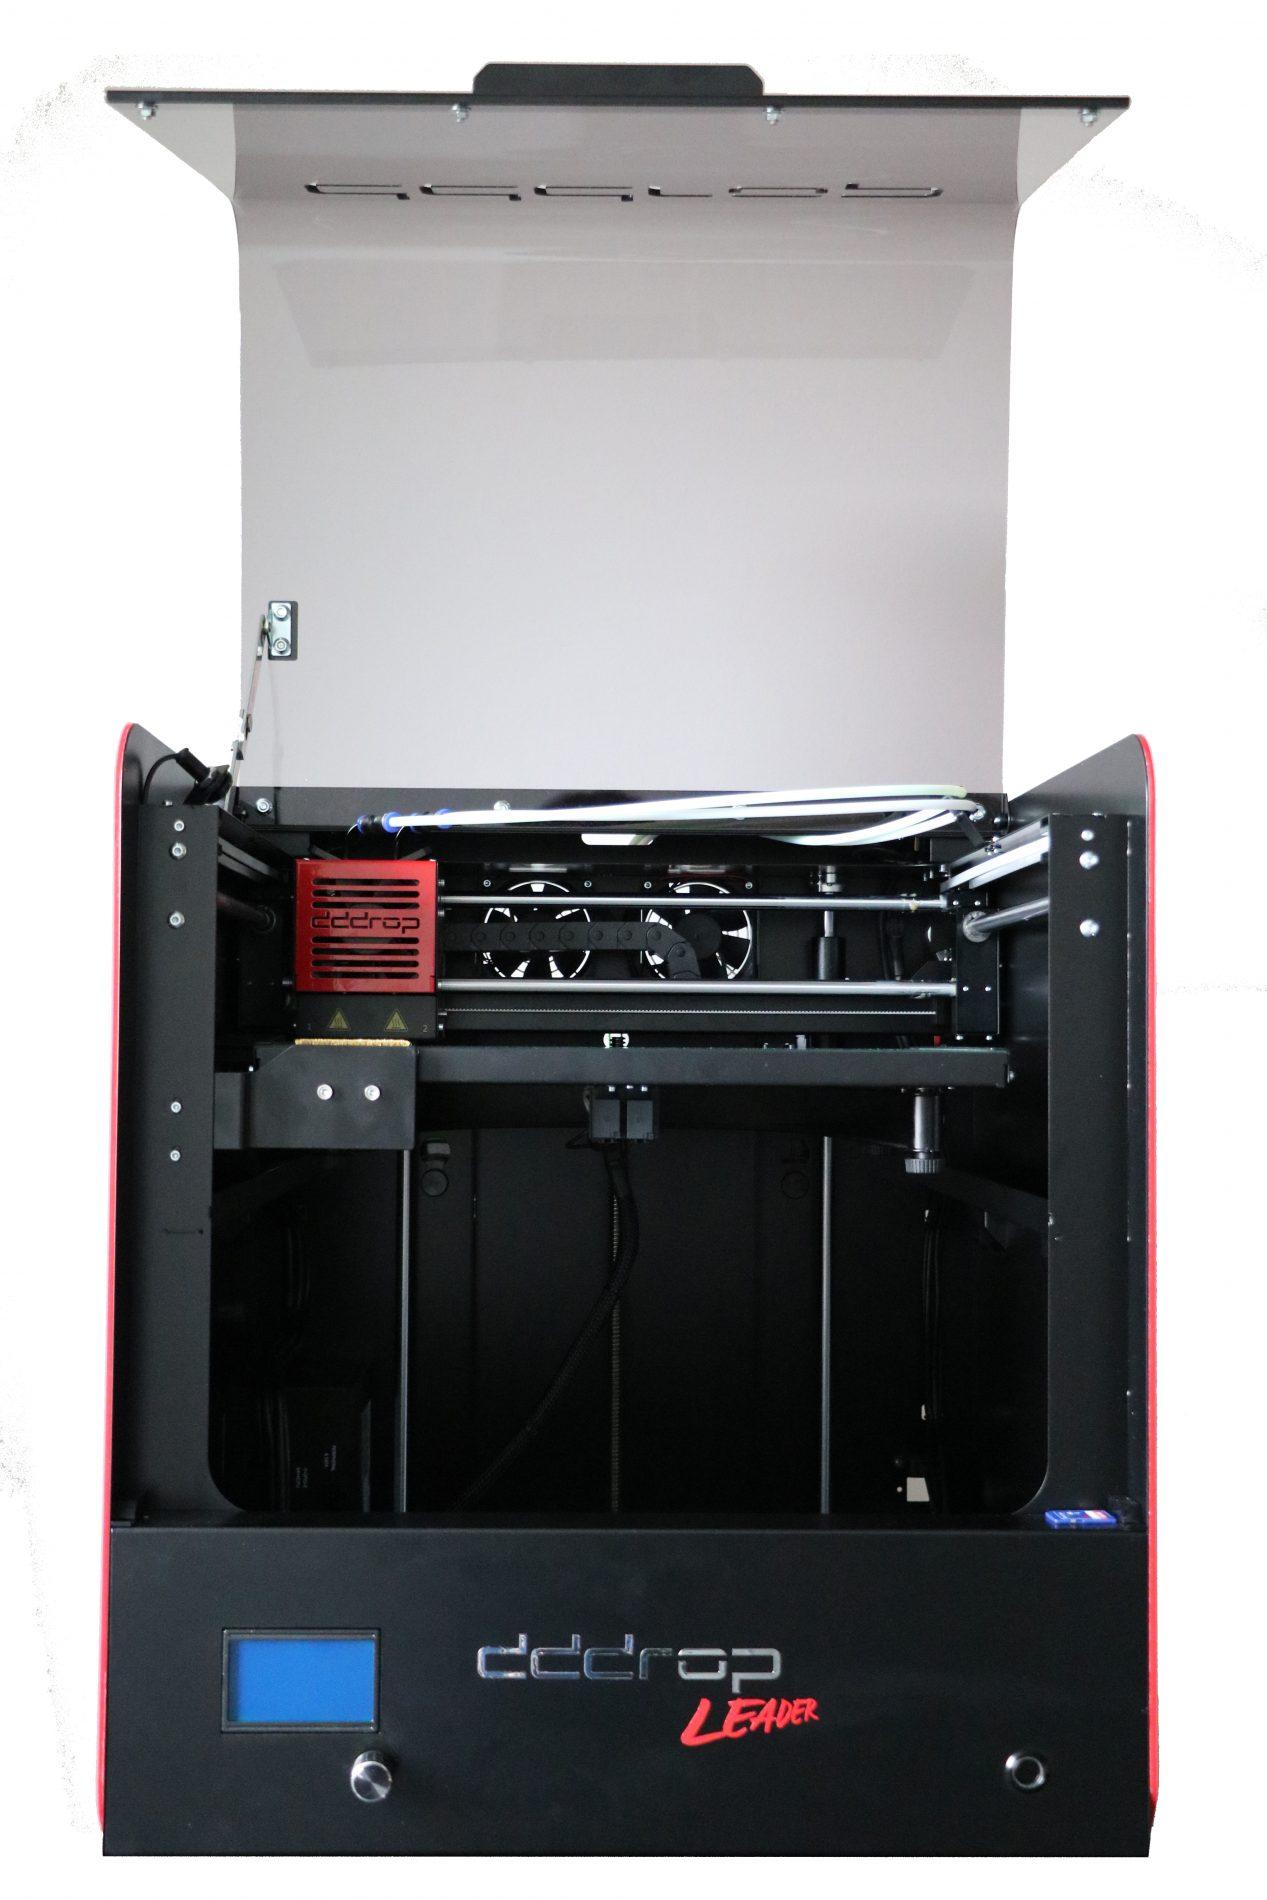 dddrop leader twin 3d printer